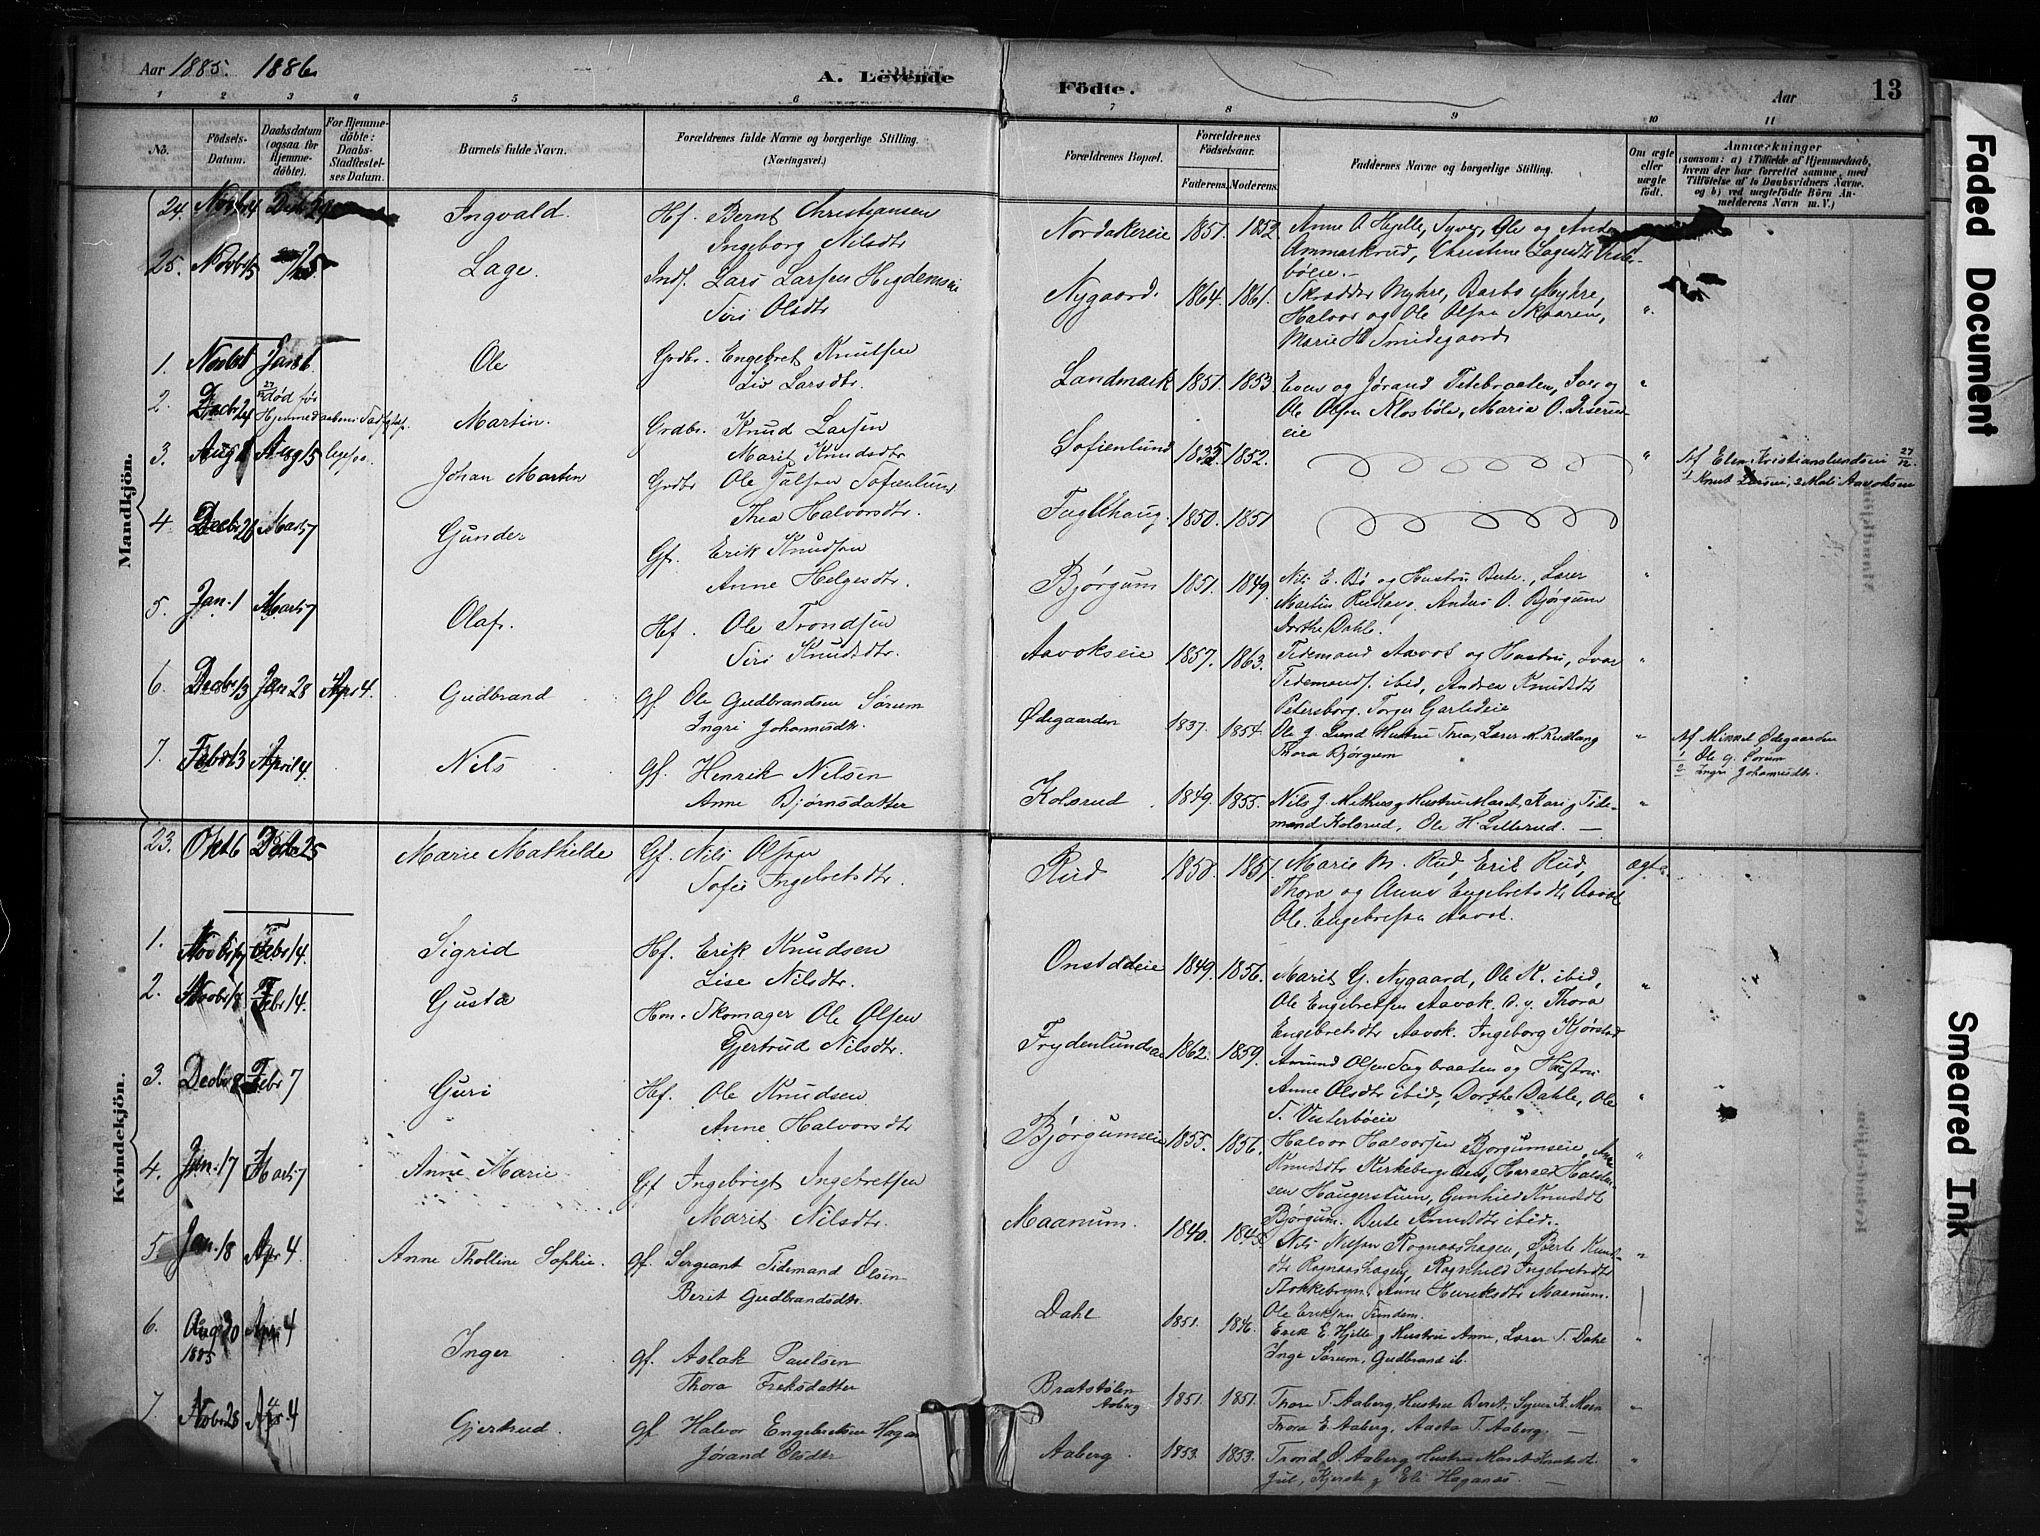 SAH, Nord-Aurdal prestekontor, Ministerialbok nr. 13, 1883-1895, s. 13